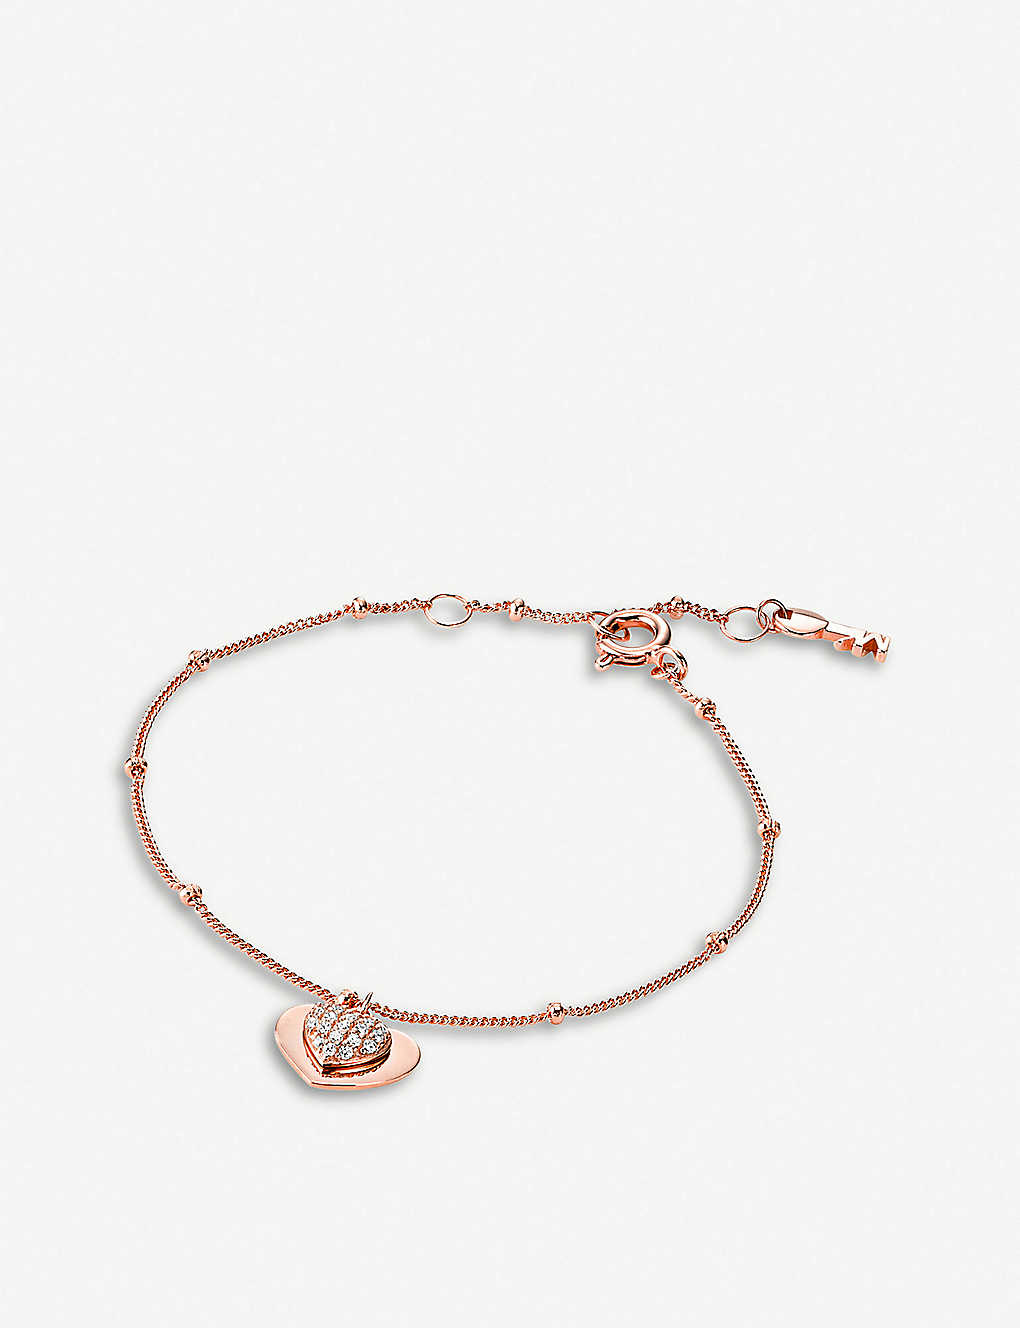 fbf3f48aaa2683 MICHAEL KORS - Love rose gold-toned sterling silver charm bracelet ...